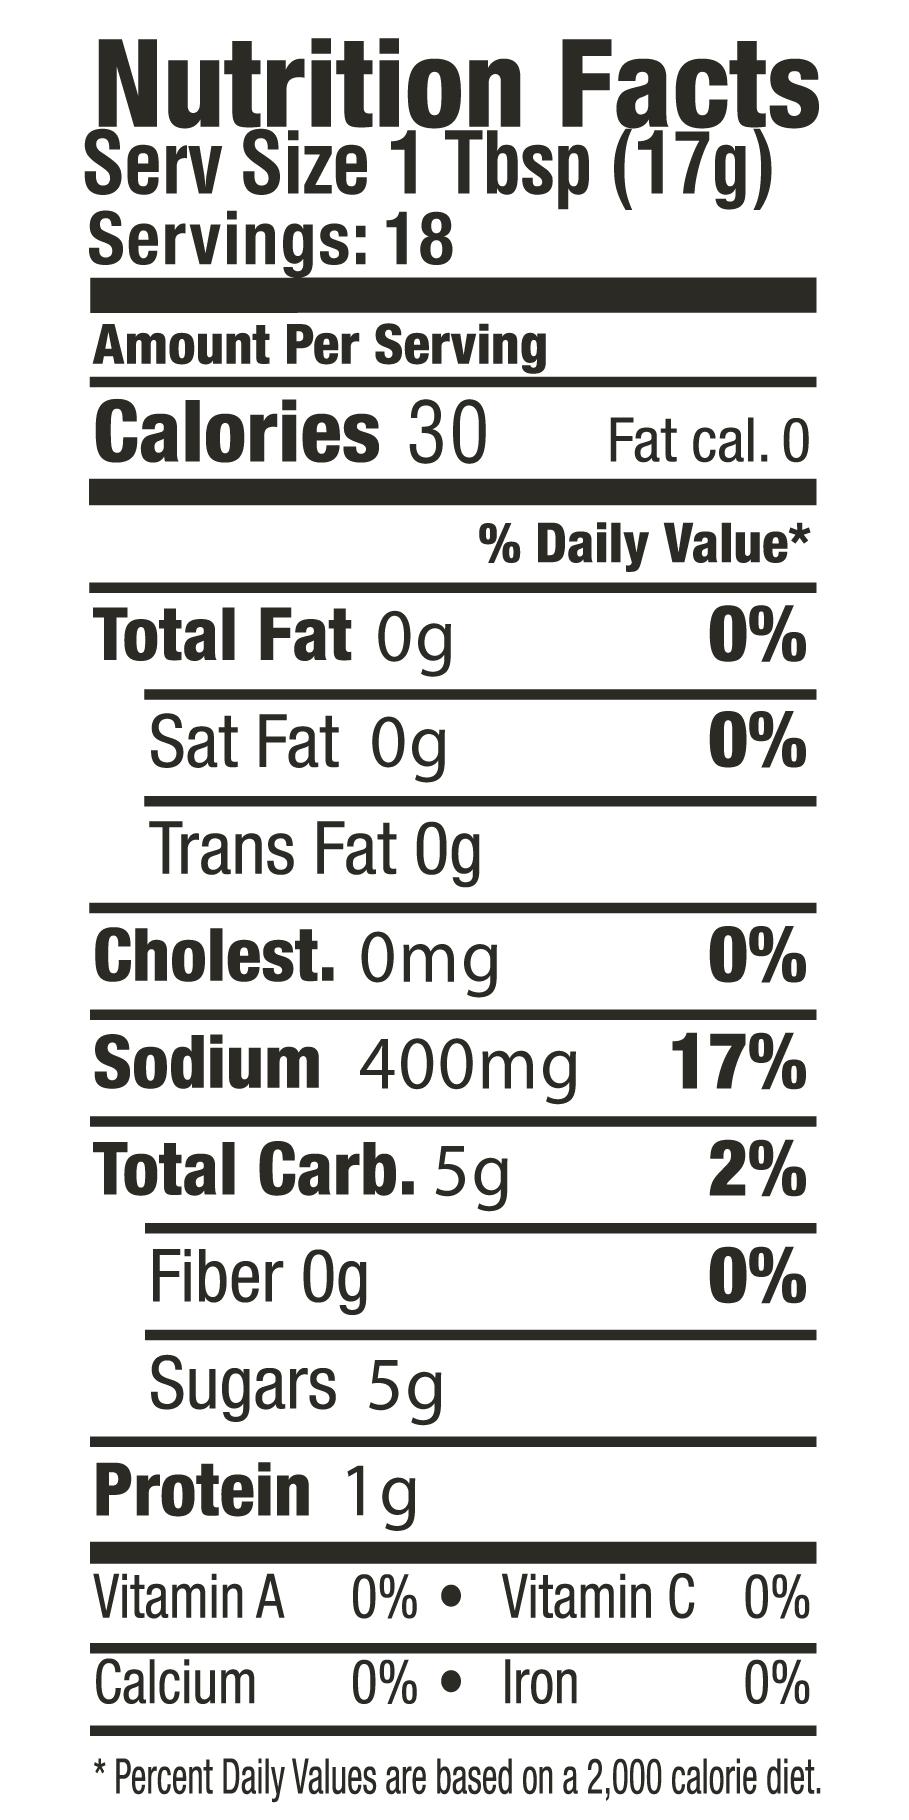 NutritionalFacts_TERIYAKI_2018.png